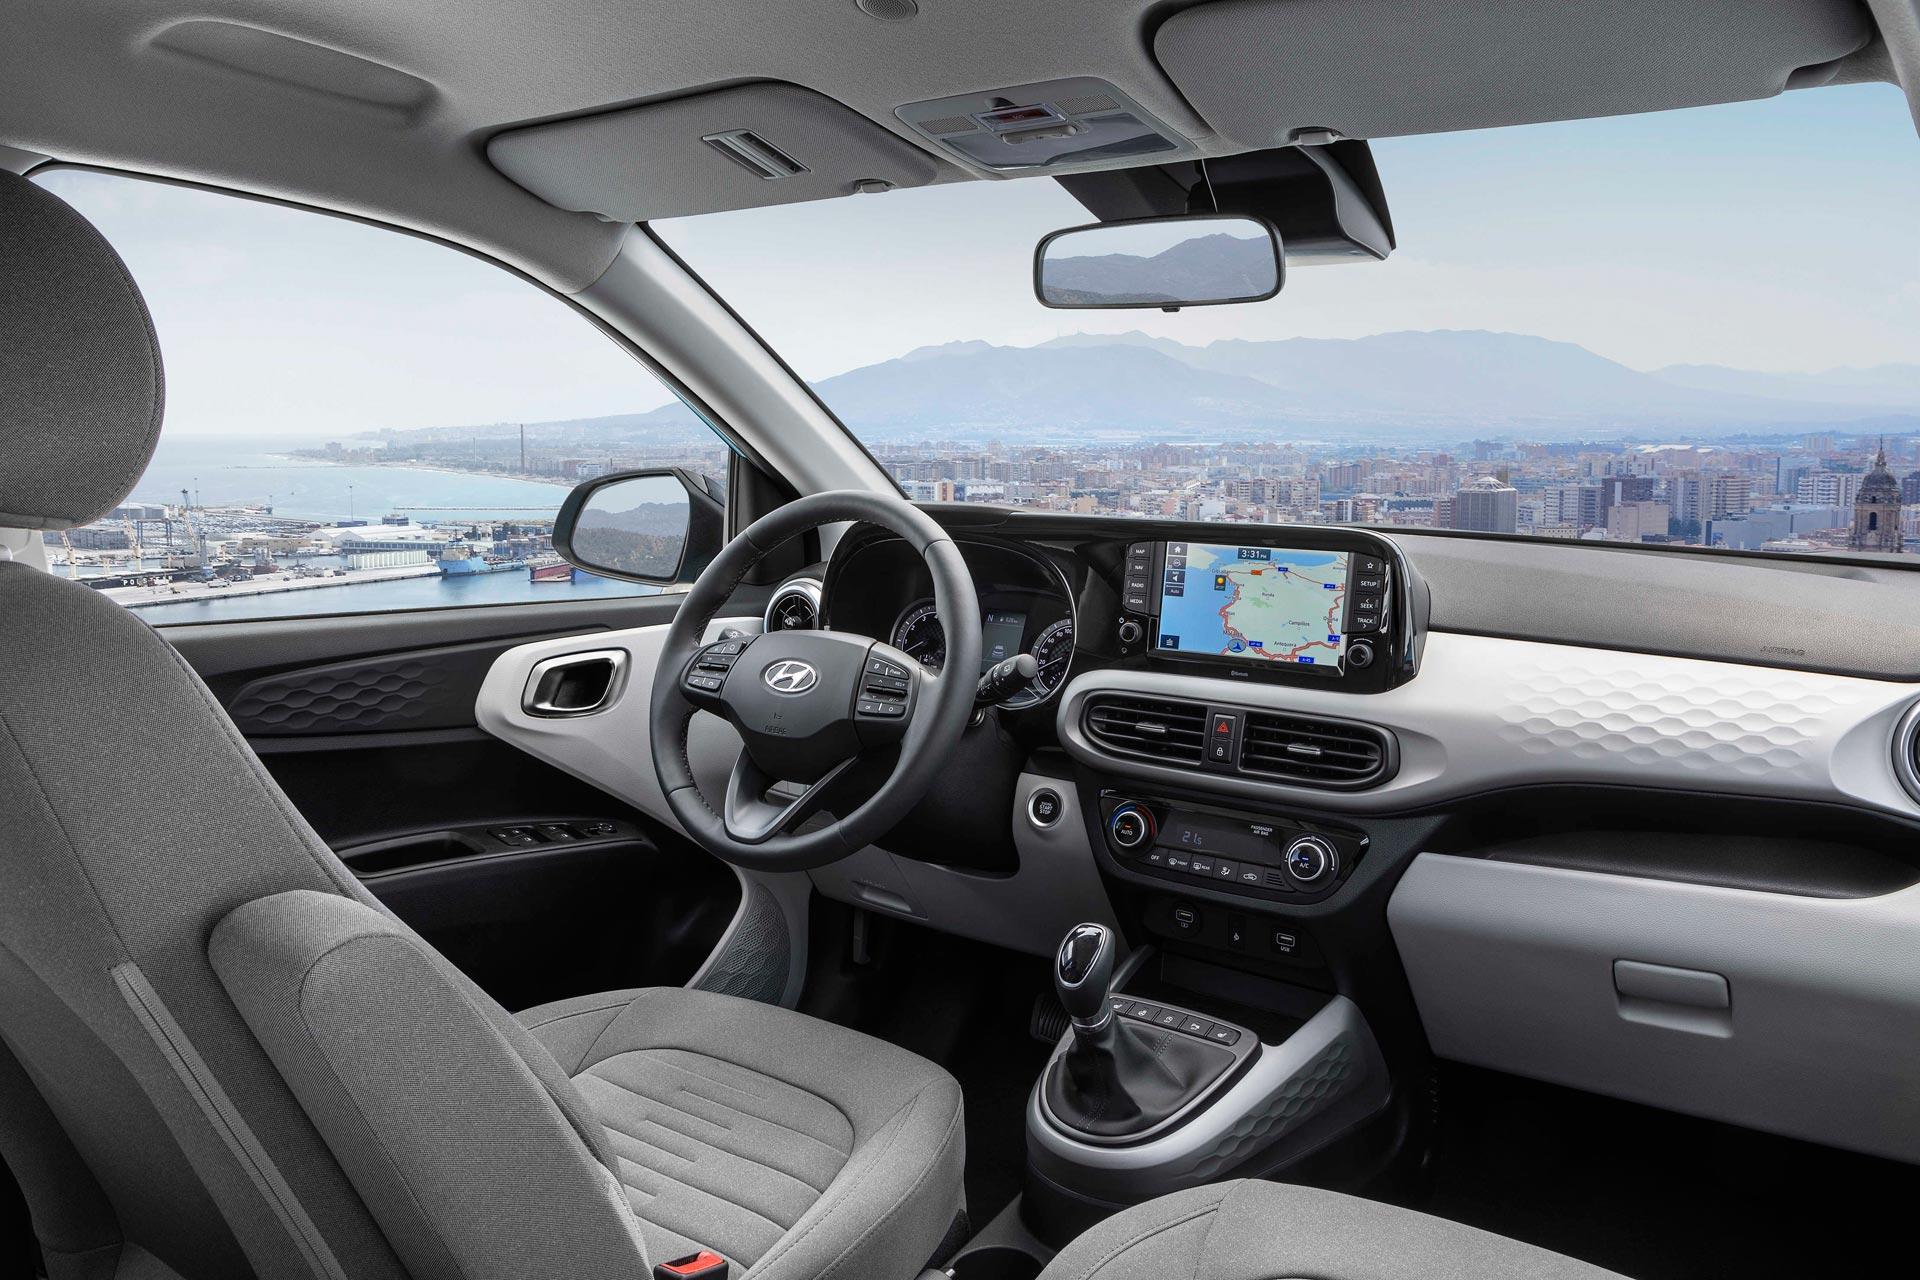 Interior Hyundai i10 2020